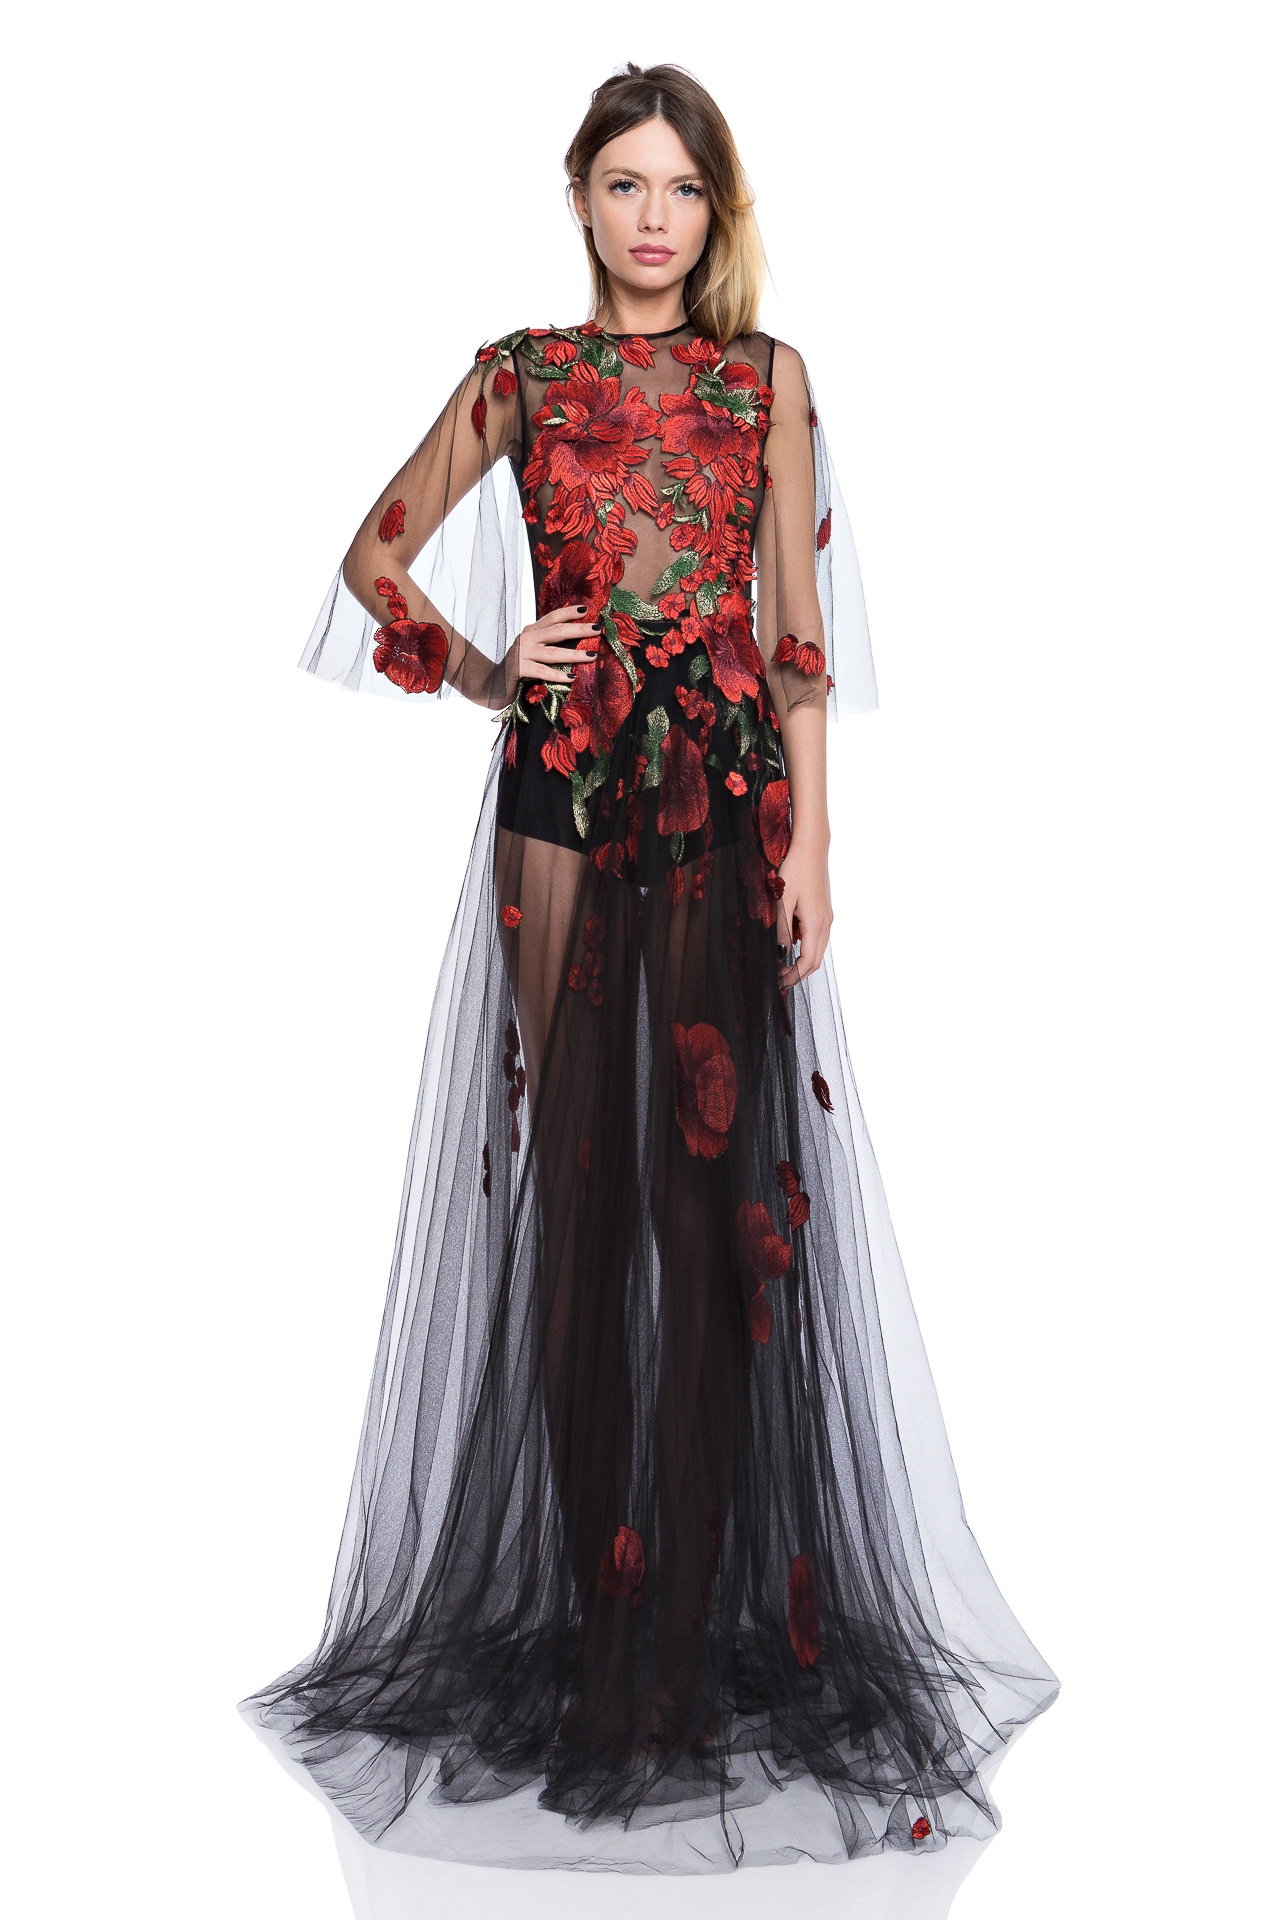 Iris-Serban-Couture-2020-1